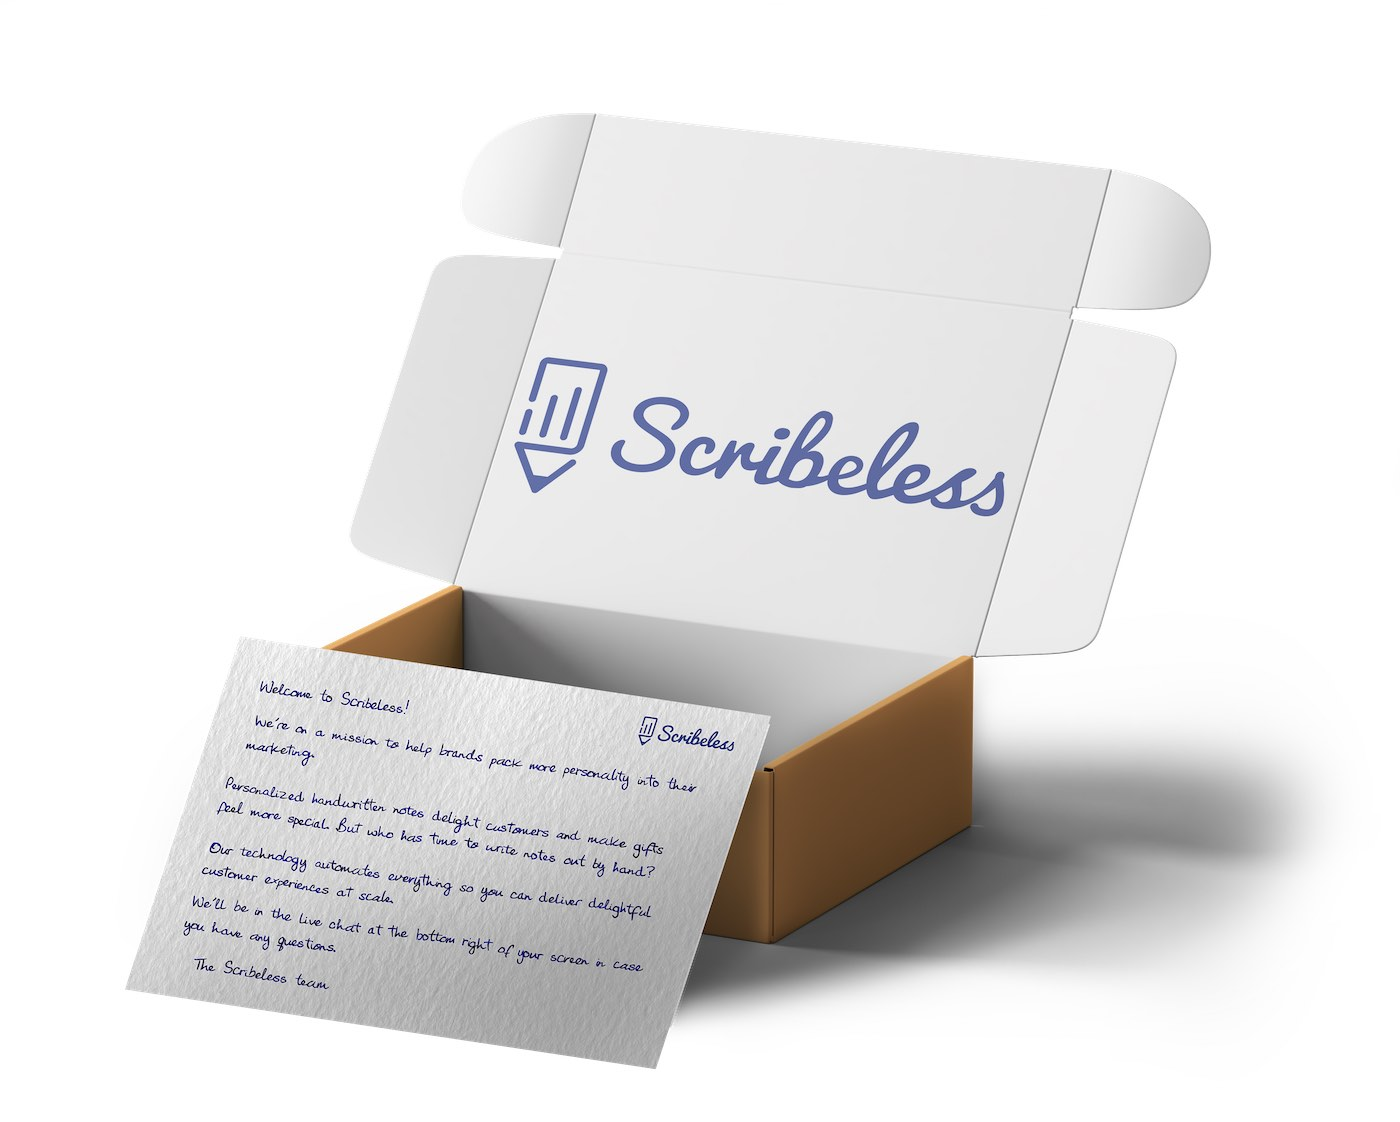 Scribeless box of handwritten notes.